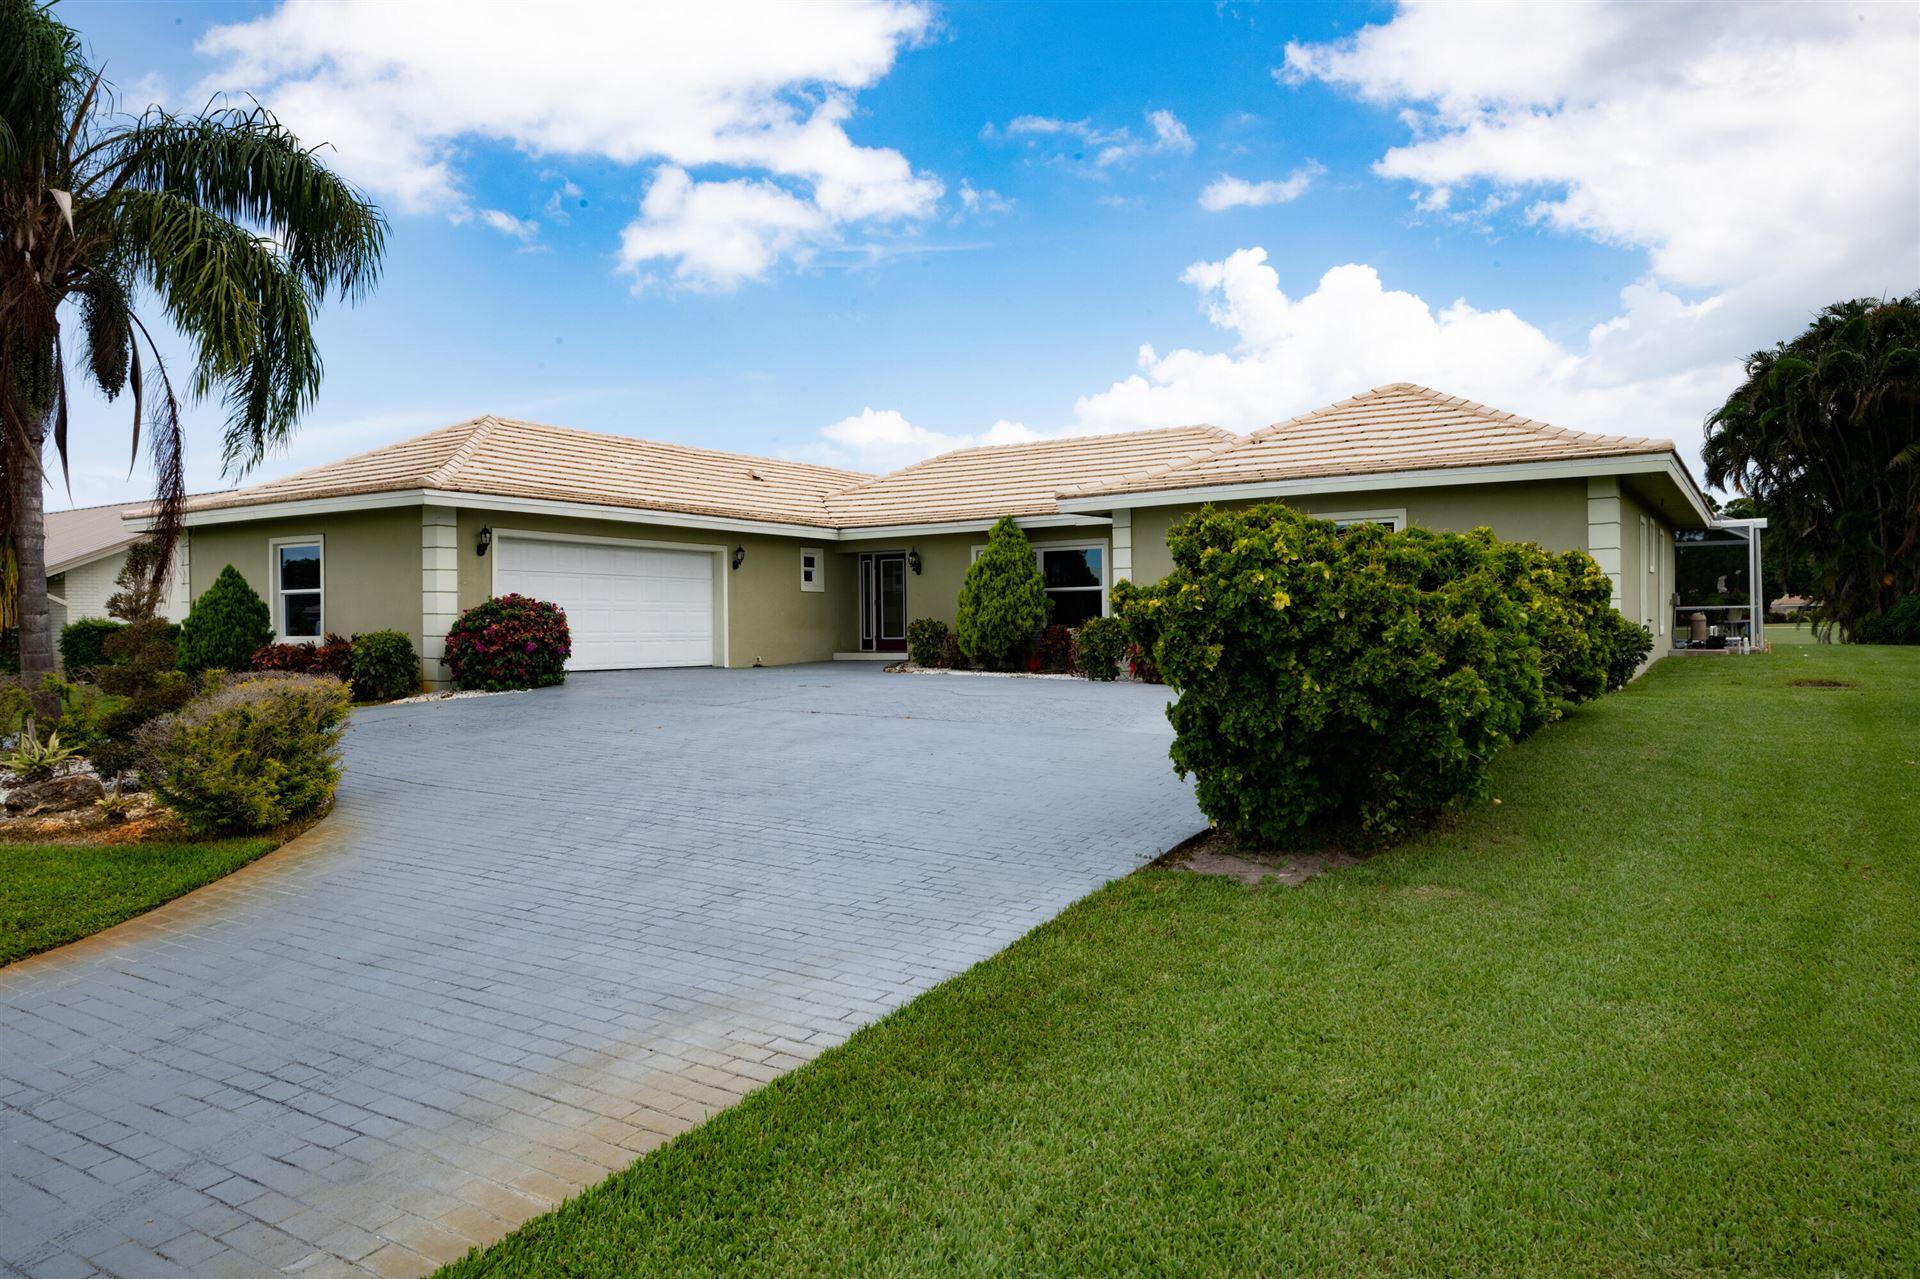 Photo of 3293 SE Fairway East, Stuart, FL 34997 (MLS # RX-10734817)